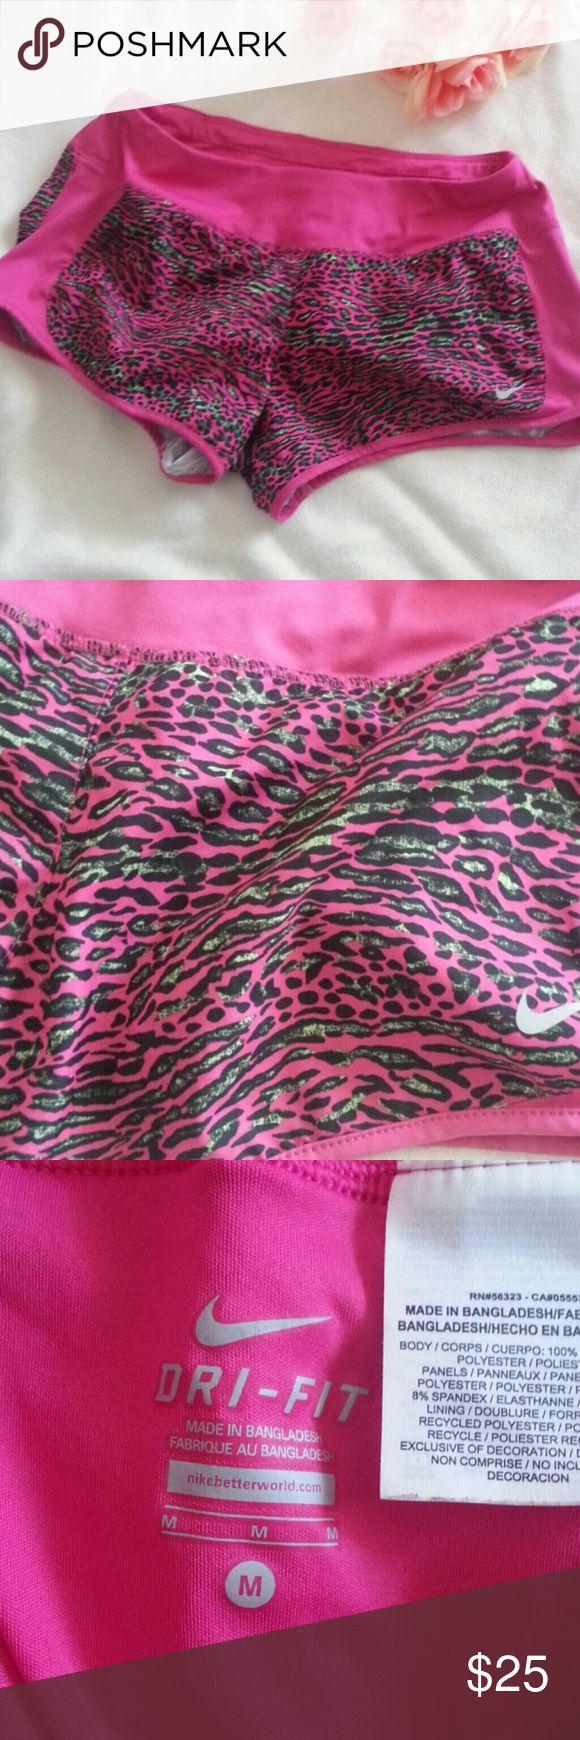 "Nike Dri-Fit Running Shorts Medium Excellent condition  Size medium Pink leopard style Waist 30"" Inseam 2.5"" Nike Shorts"